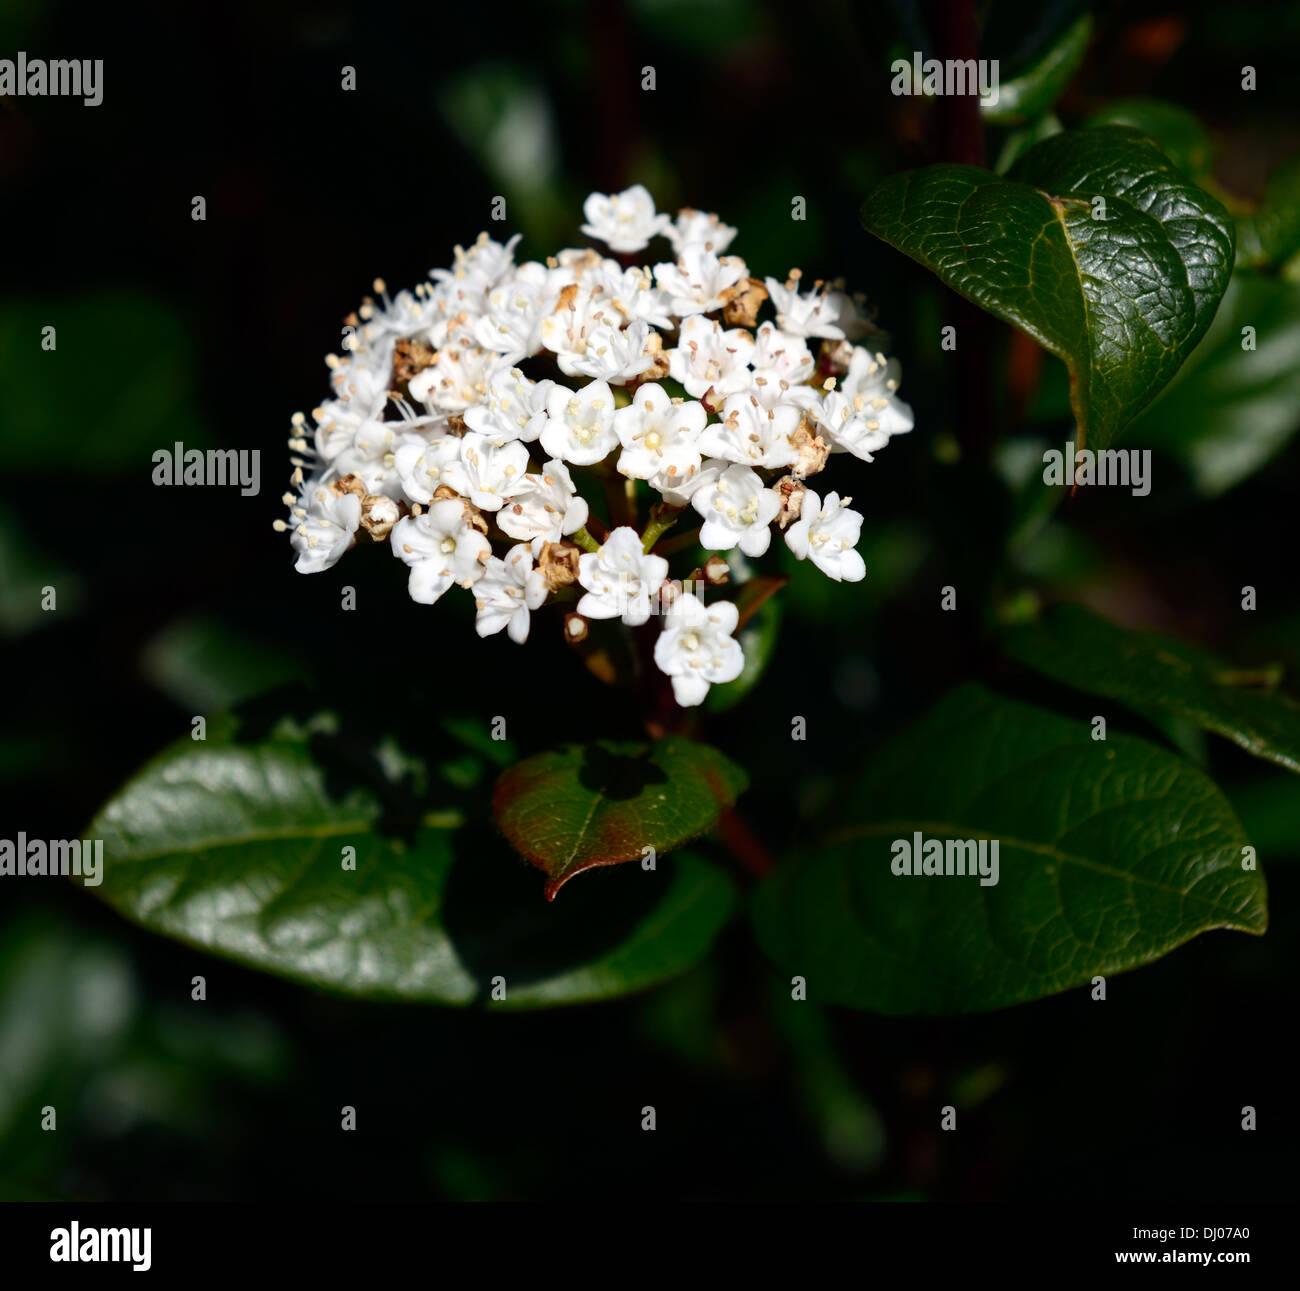 viburnum tinus var hirtum closeups plant portraits selective focus shrubs flowers white spring - Stock Image